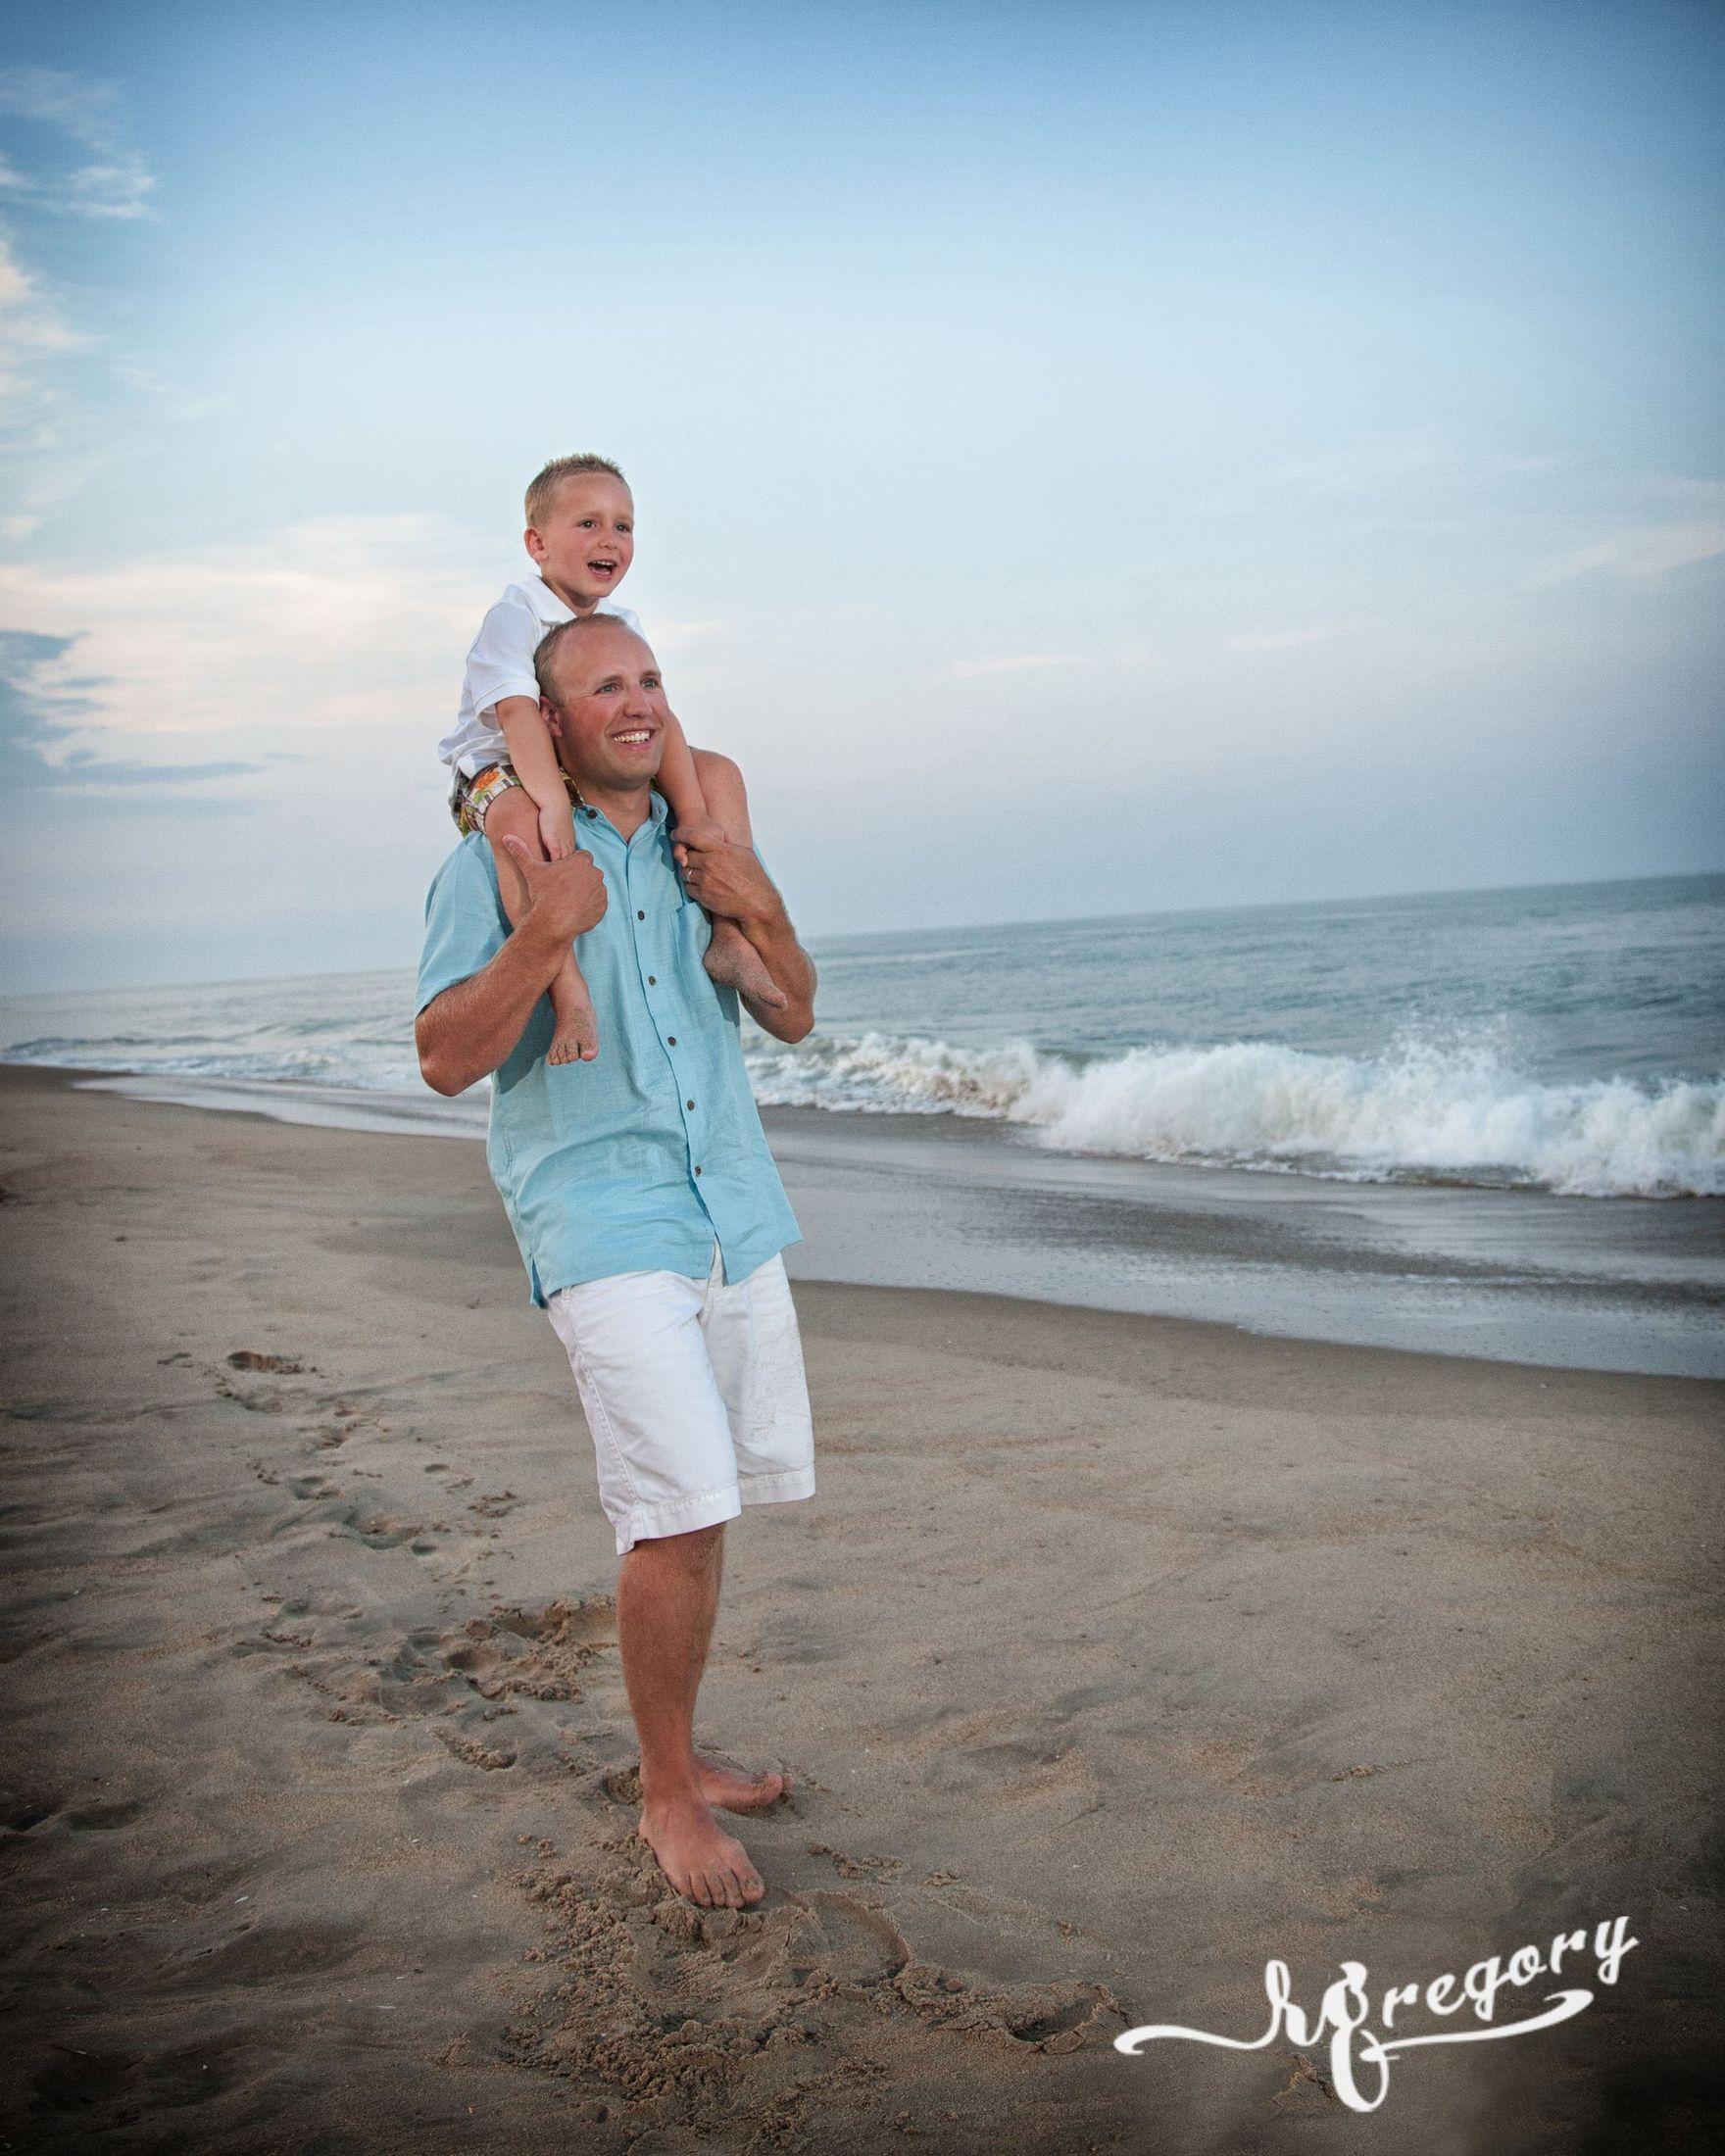 Napekoski father and son child pro beach photo